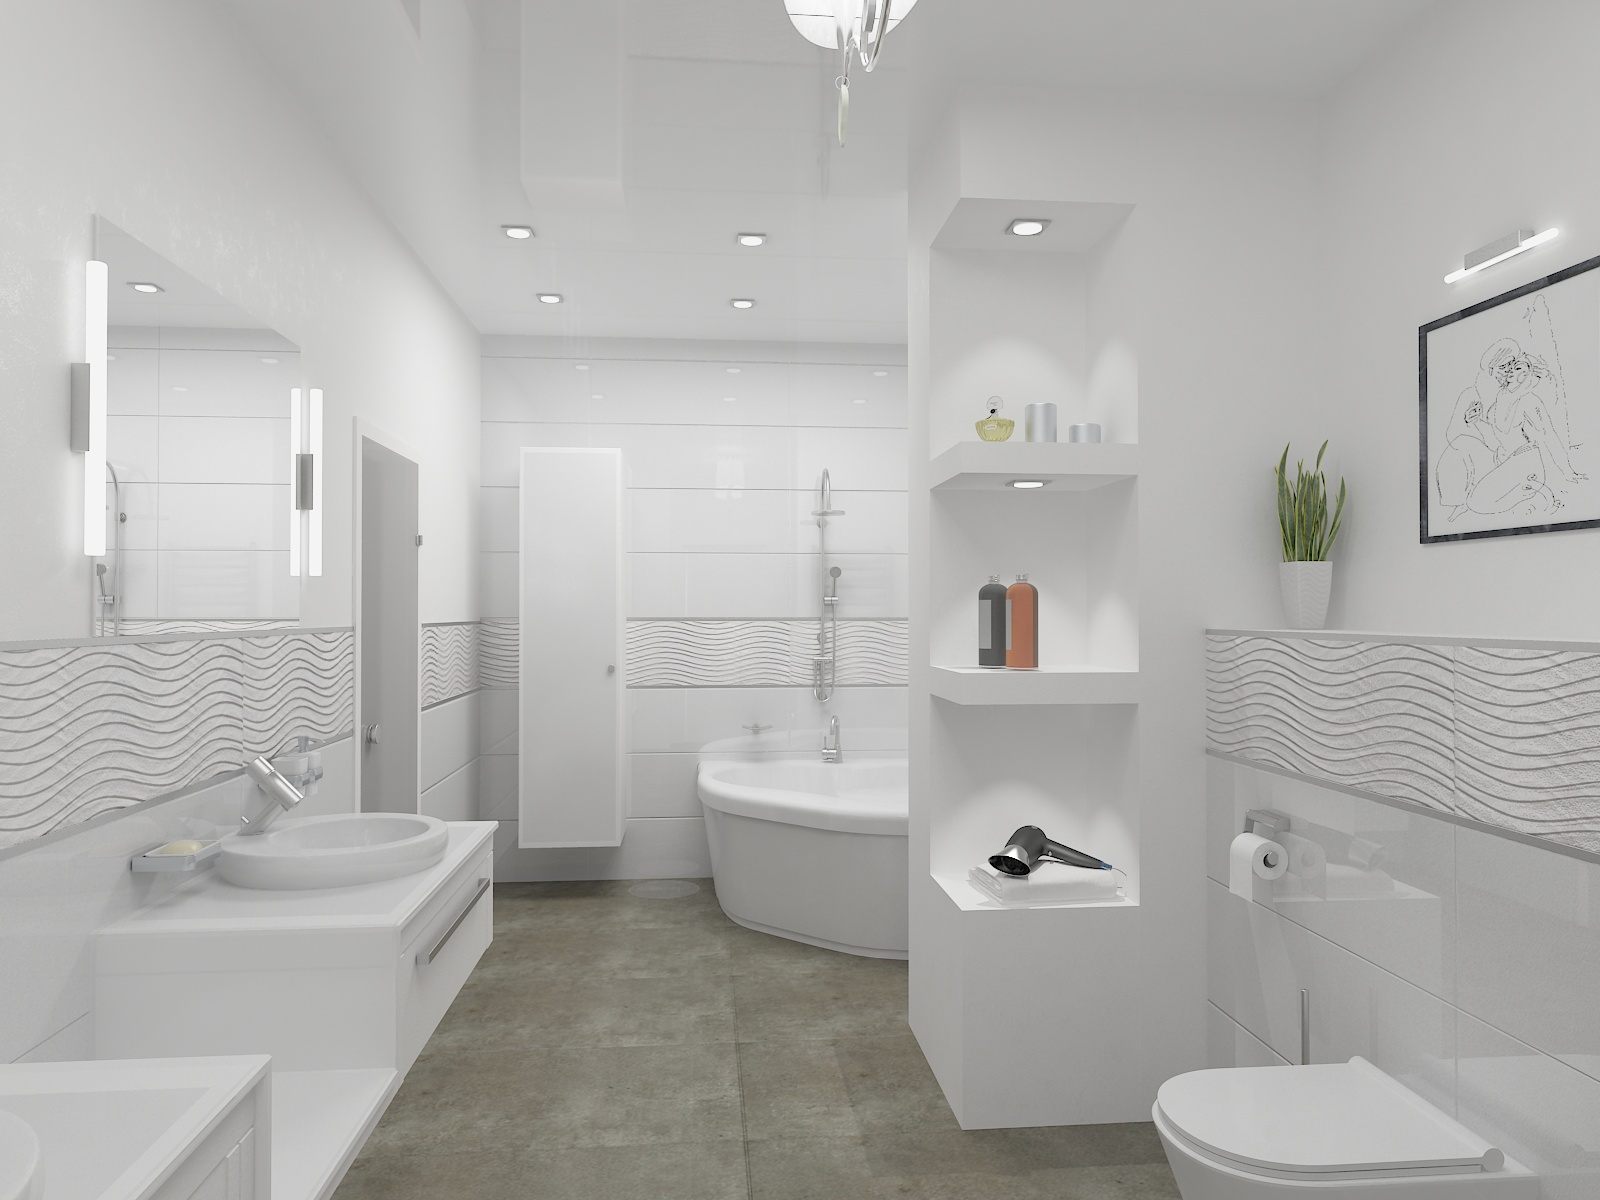 Квартира по адресу Салтыкова-Щедрина. Сан узел и ванна Светлые тона